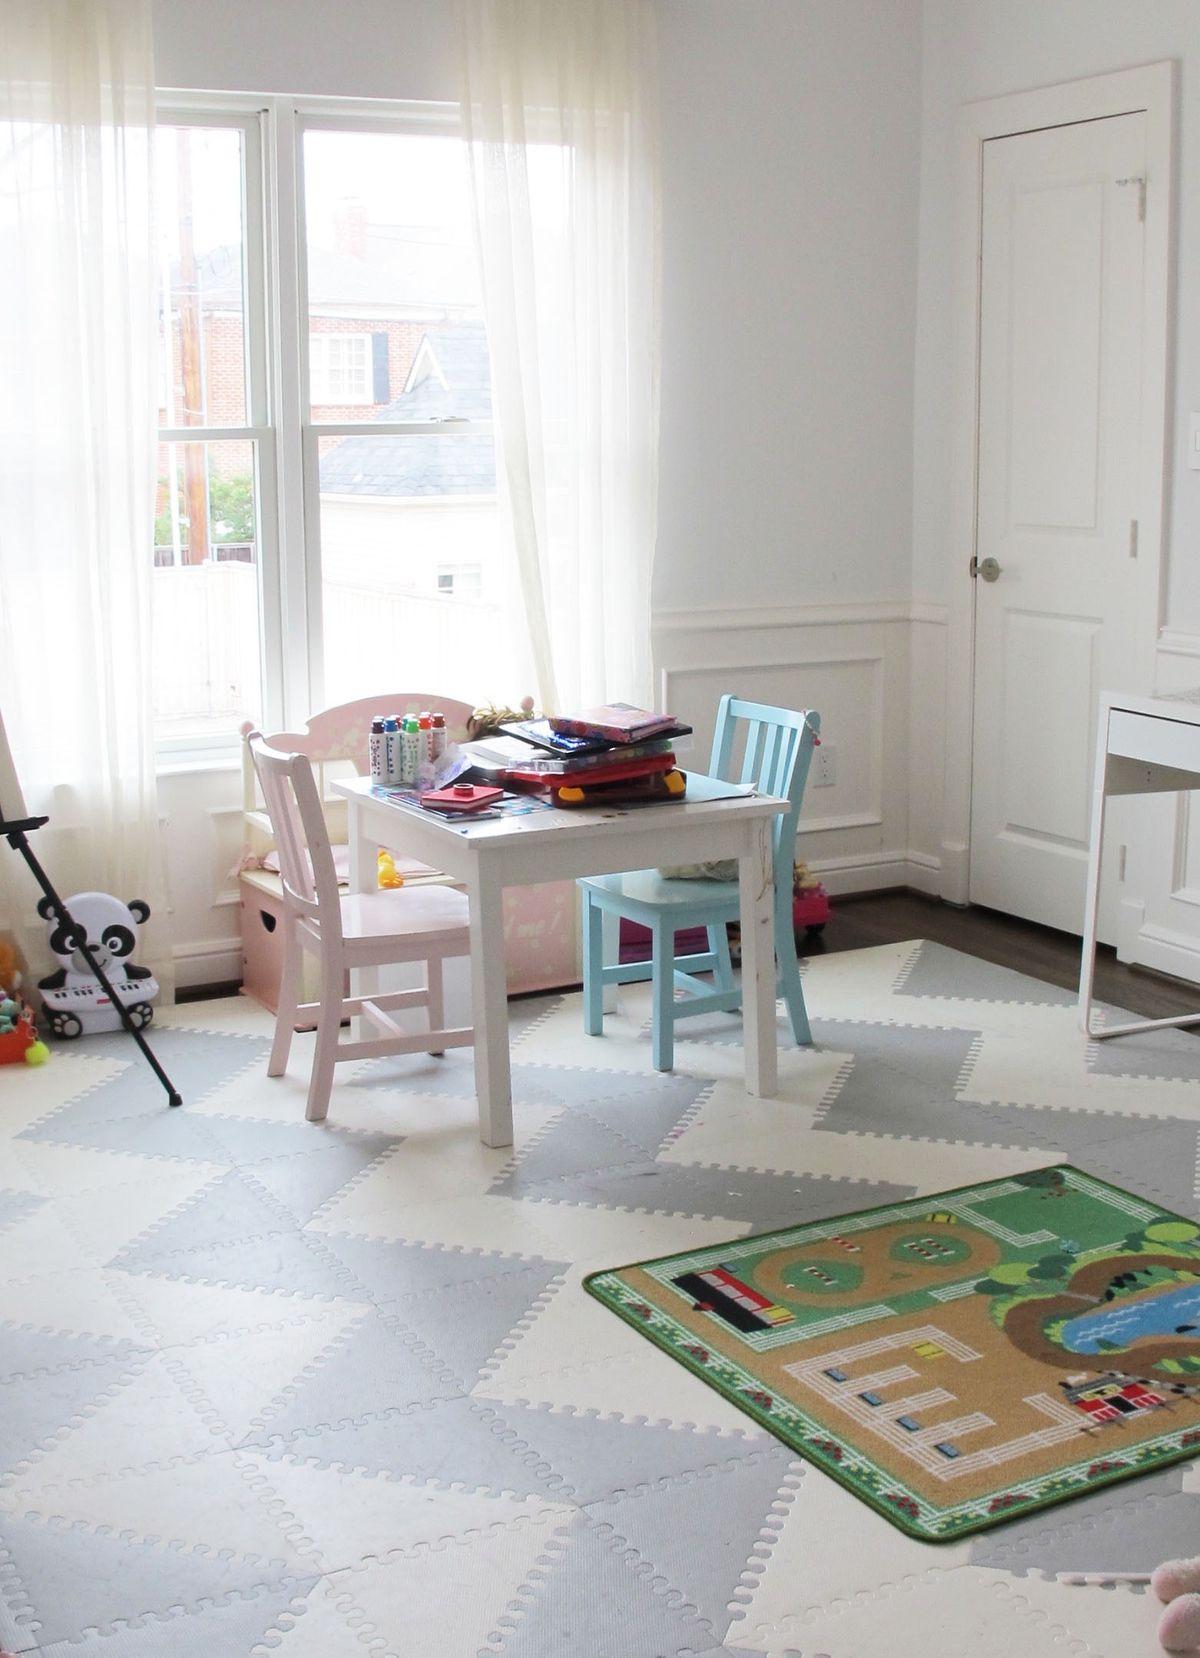 Donohoe Contemporary Modern Home Photo Video Shoot Location 1.jpg